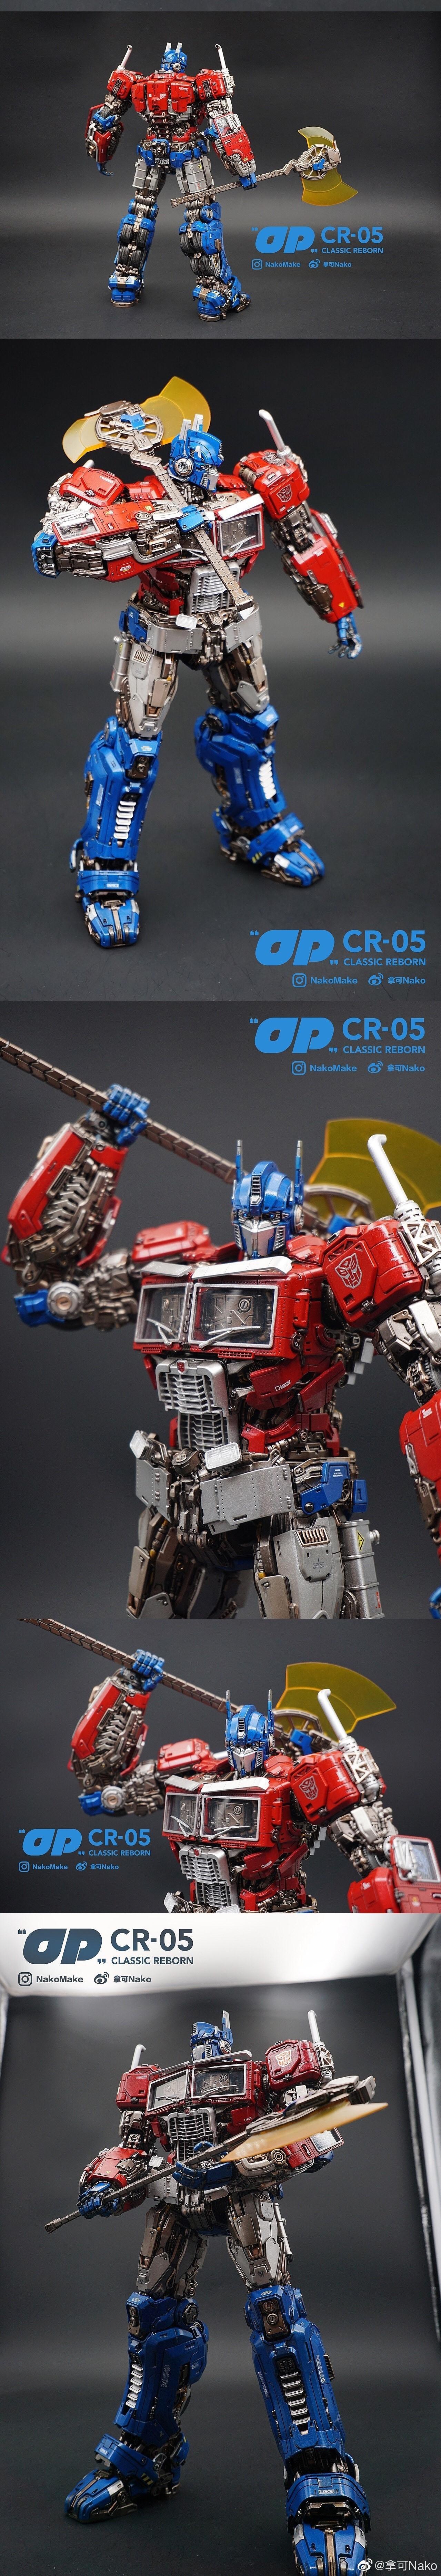 G798_NakoMake_Optimus_Prime_BUMBLEBEE_ver_GK_026_2.jpg